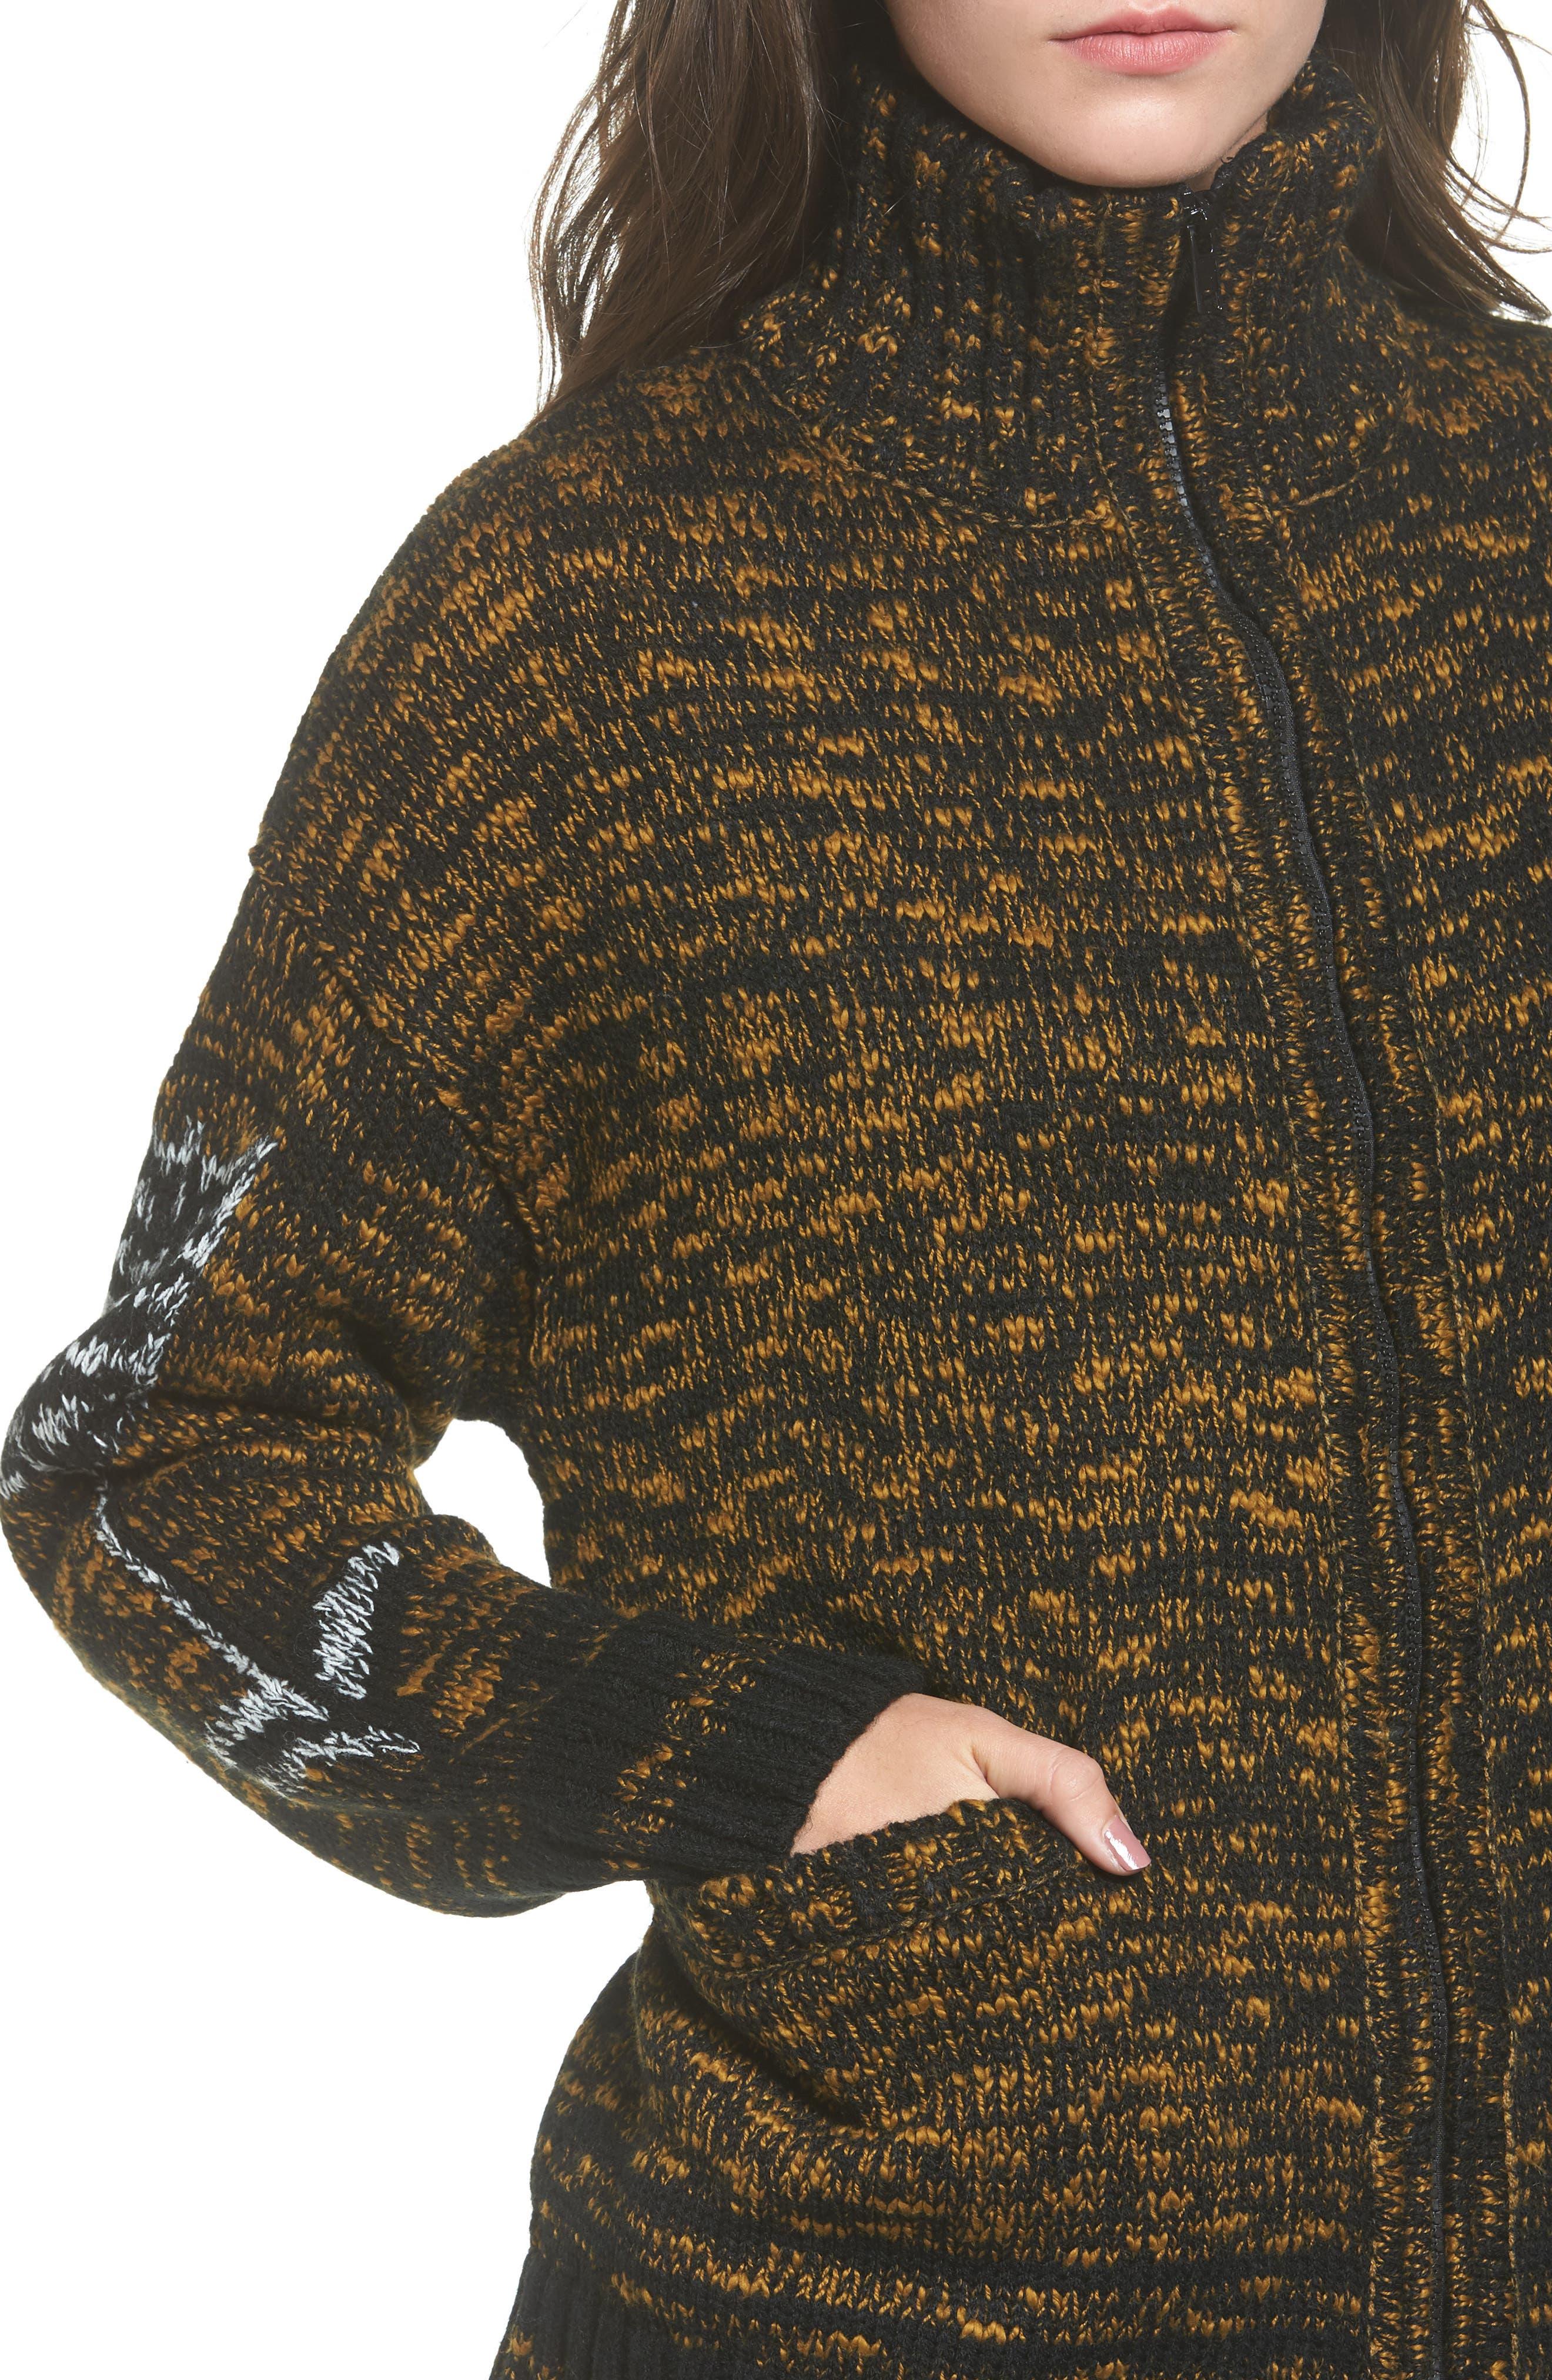 Tunnel Vision Zip Jacket,                             Alternate thumbnail 4, color,                             Olive Multi